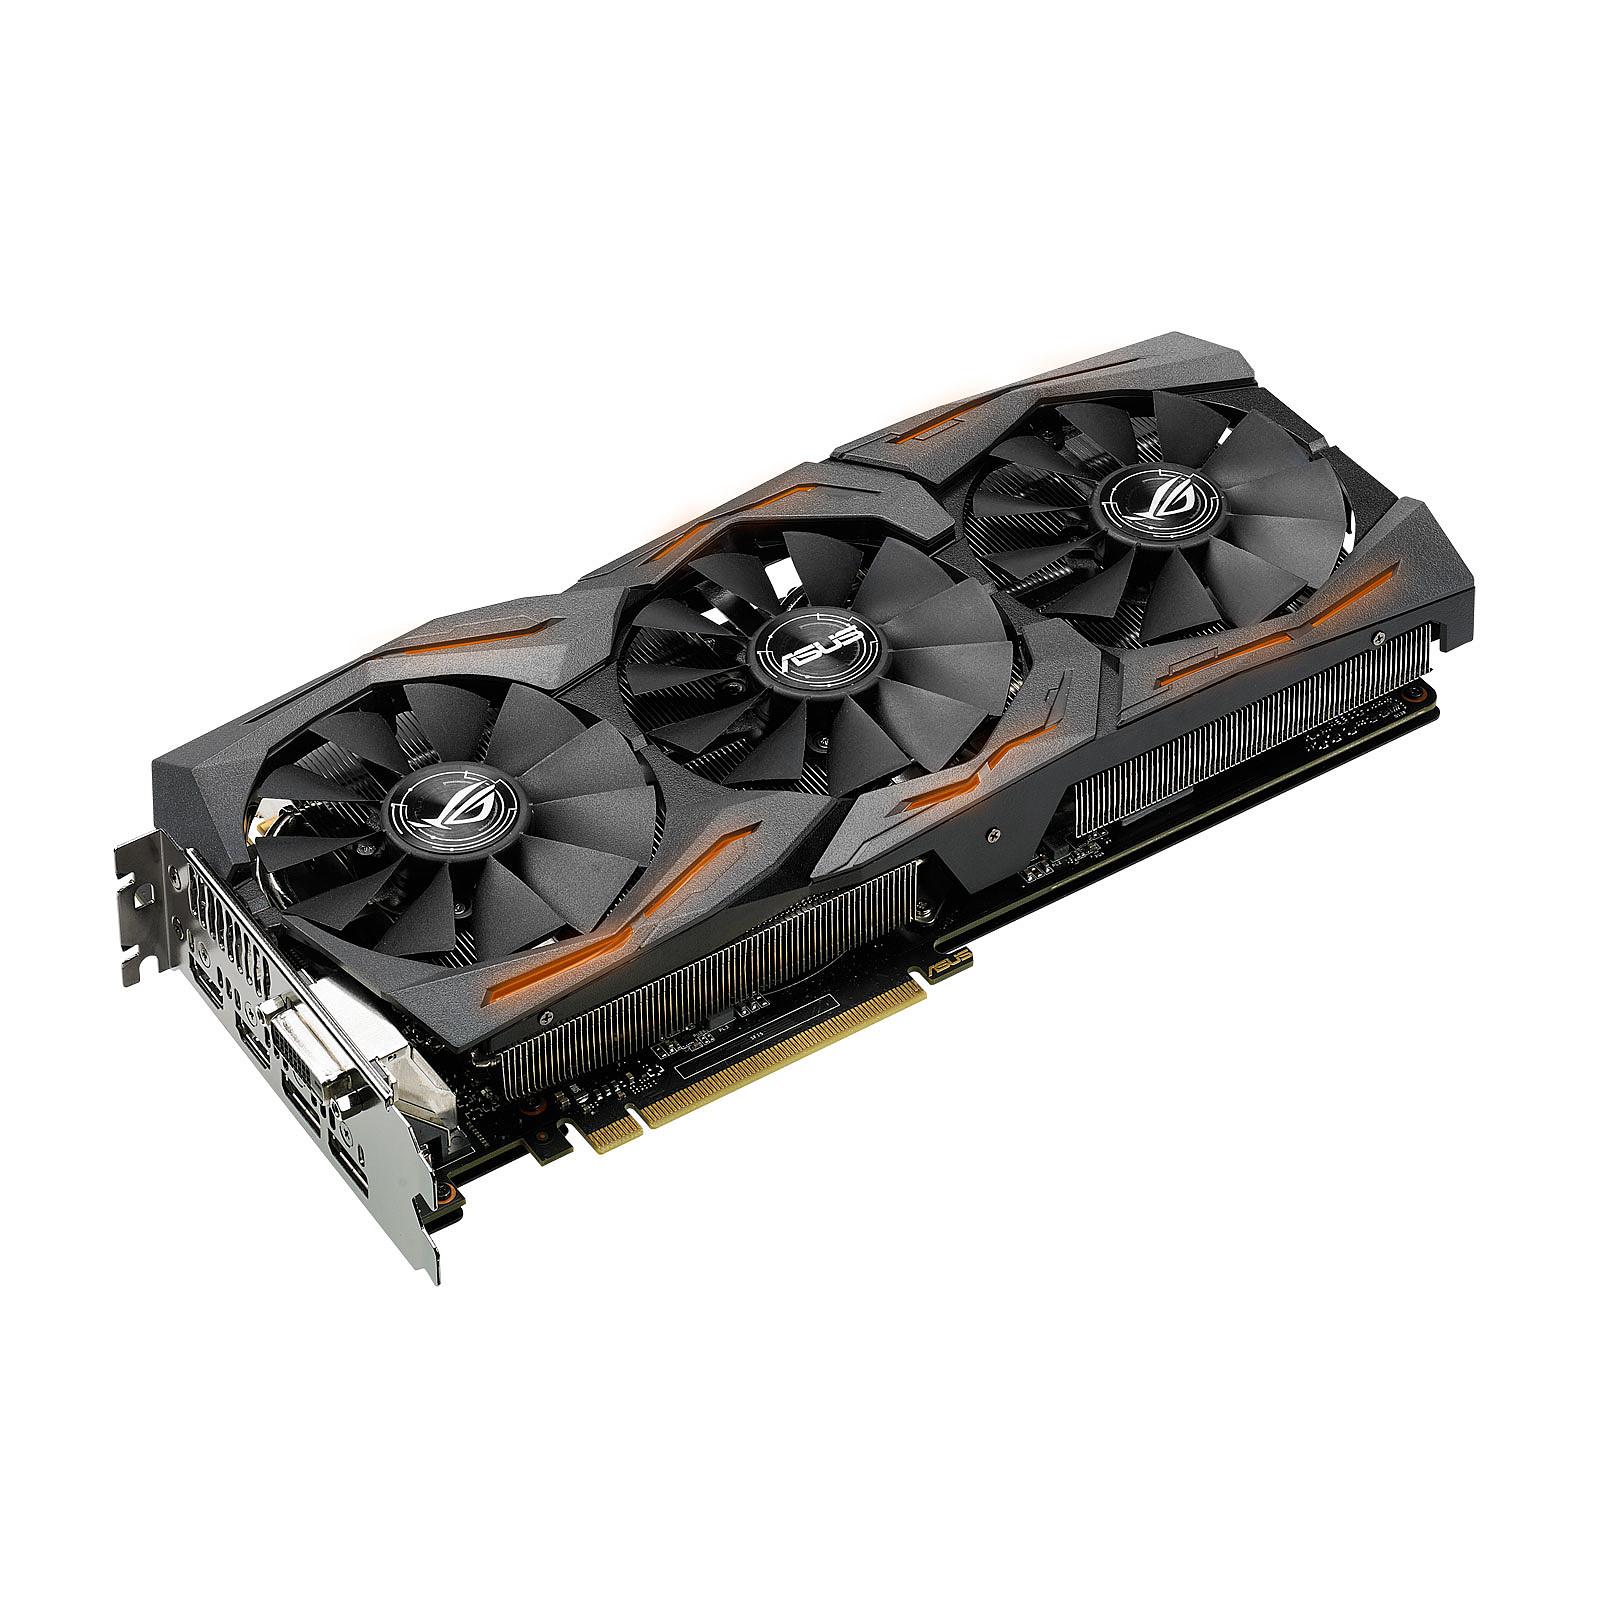 ASUS GeForce GTX 1070 ROG STRIX-GTX1070-8G-GAMING